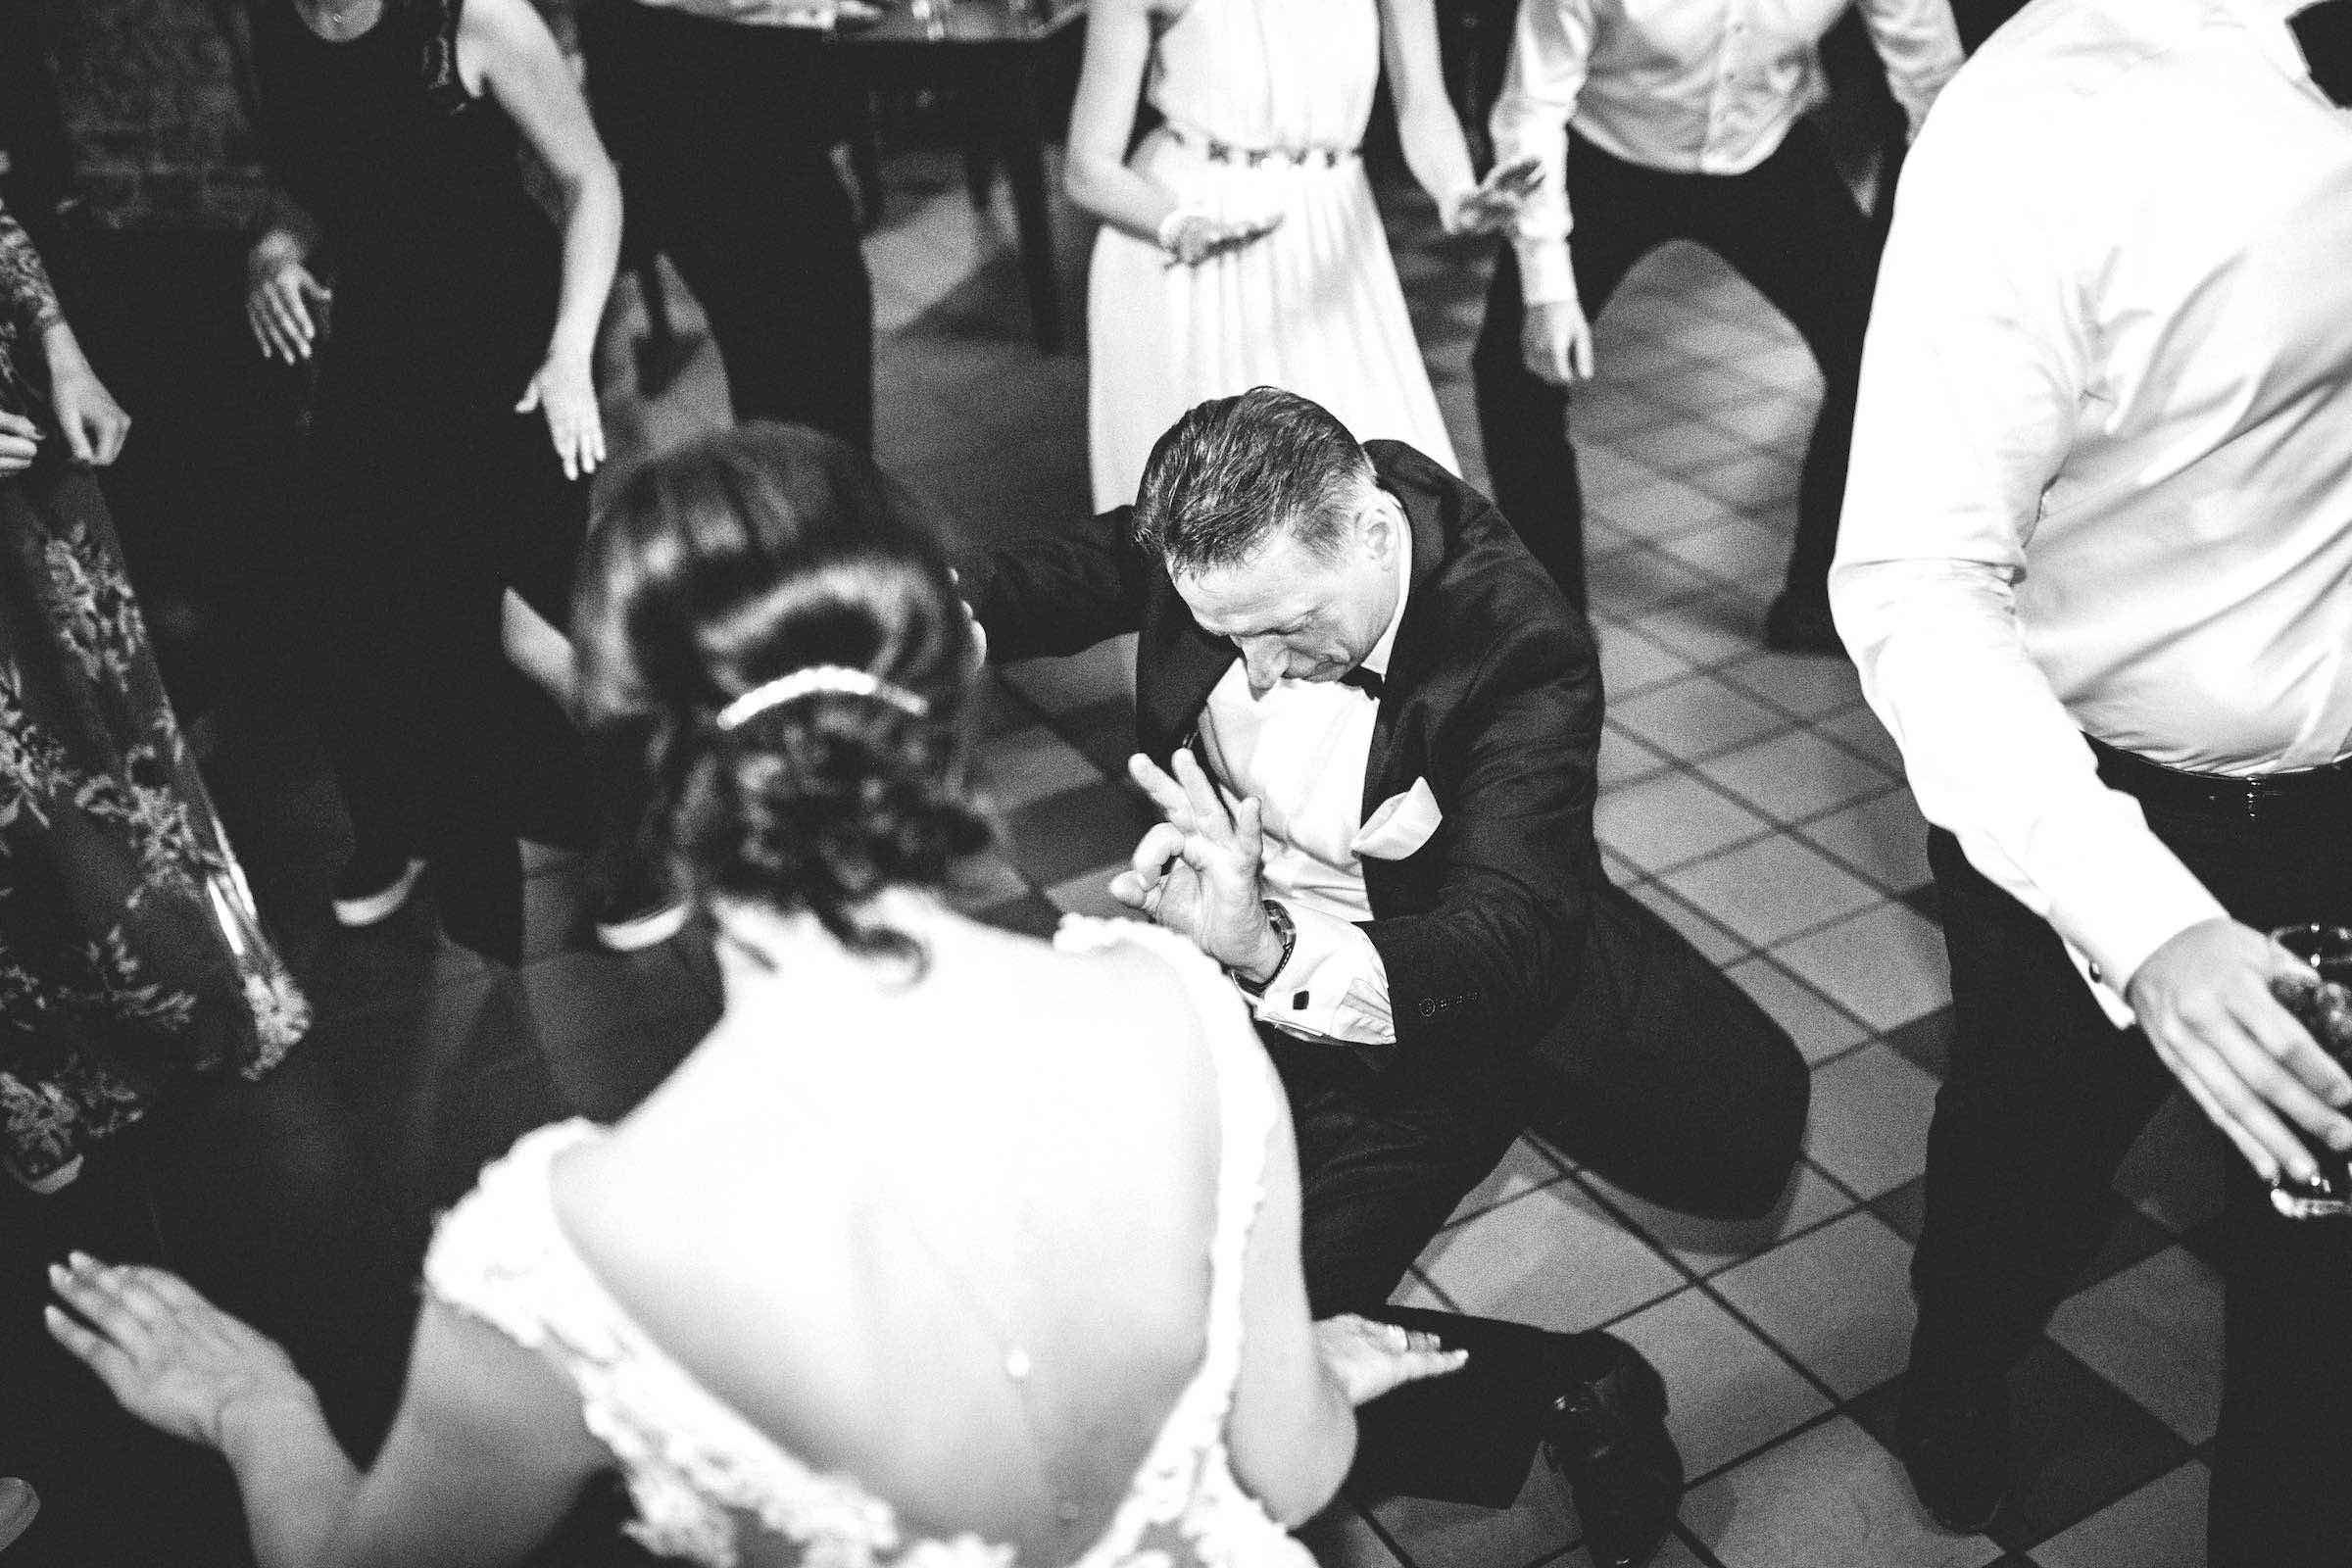 DJ | Hochzeit | Hamburg | DJ | Agentur | DJ | Messe | DJ | Firmenevent | Firmenfeier | DJ | Geburtstag | Discjockey | Party | DJ | Sommerfest | Event | Buchen | Hamburg | Mieten | Hamburgfeiert